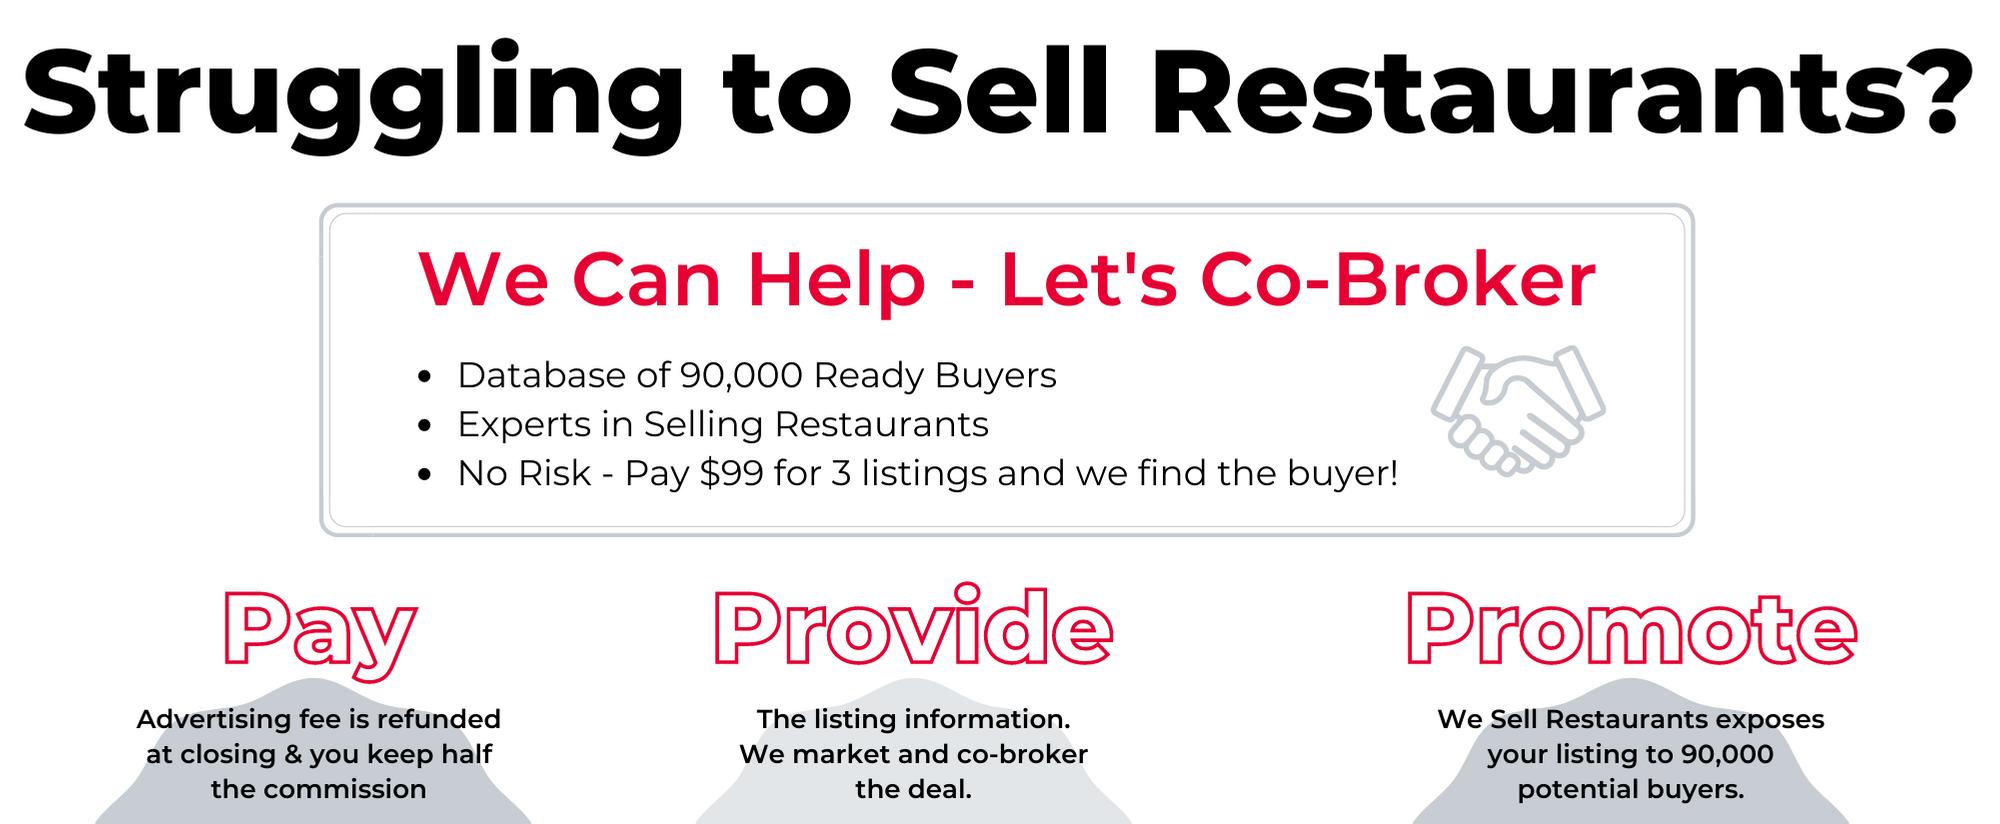 Struggling to Sell Restaurants_